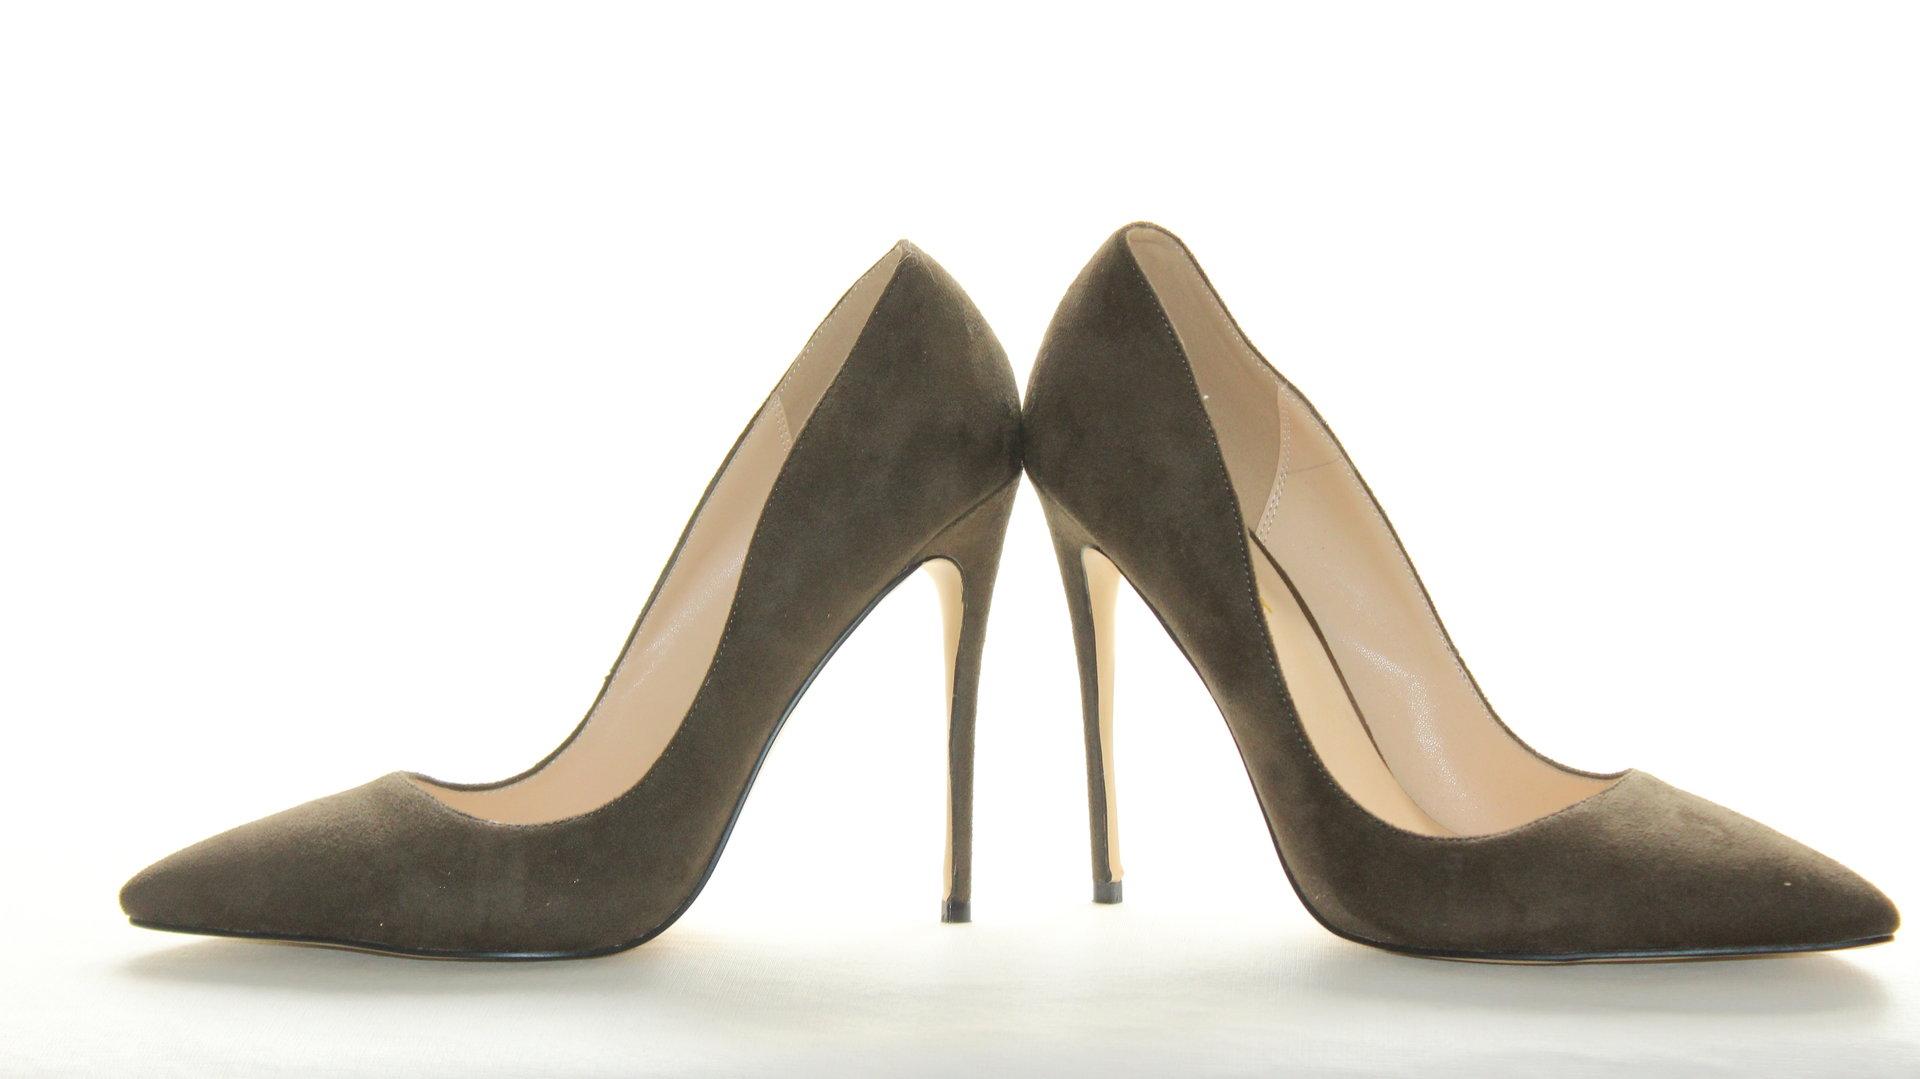 54c549cd9dd69e GUOAR High Heels Stilettos Pumps 41 - wolkengang.de - Schuhe Fashion ...